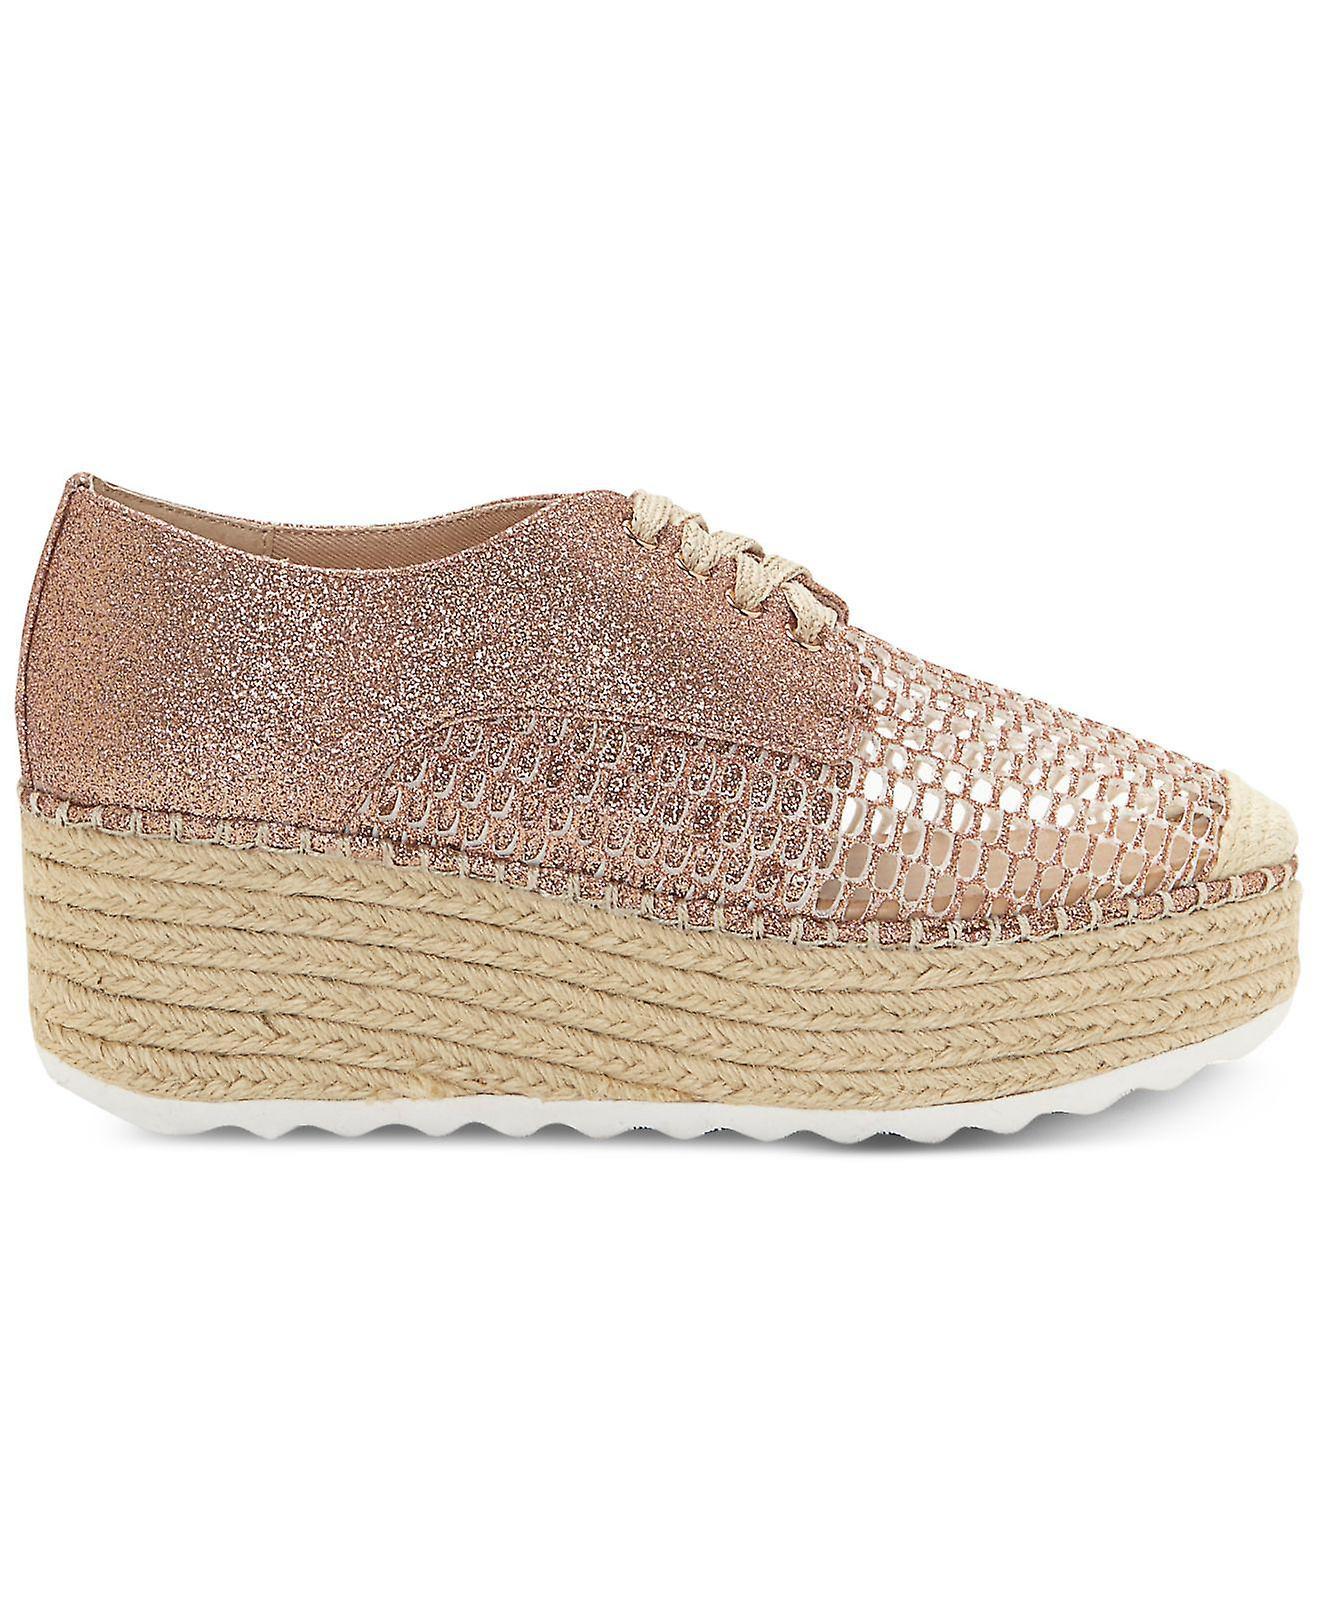 INC International Concepts Womens Abrelia Fabric Low Top Lace Up Fashion Snea...